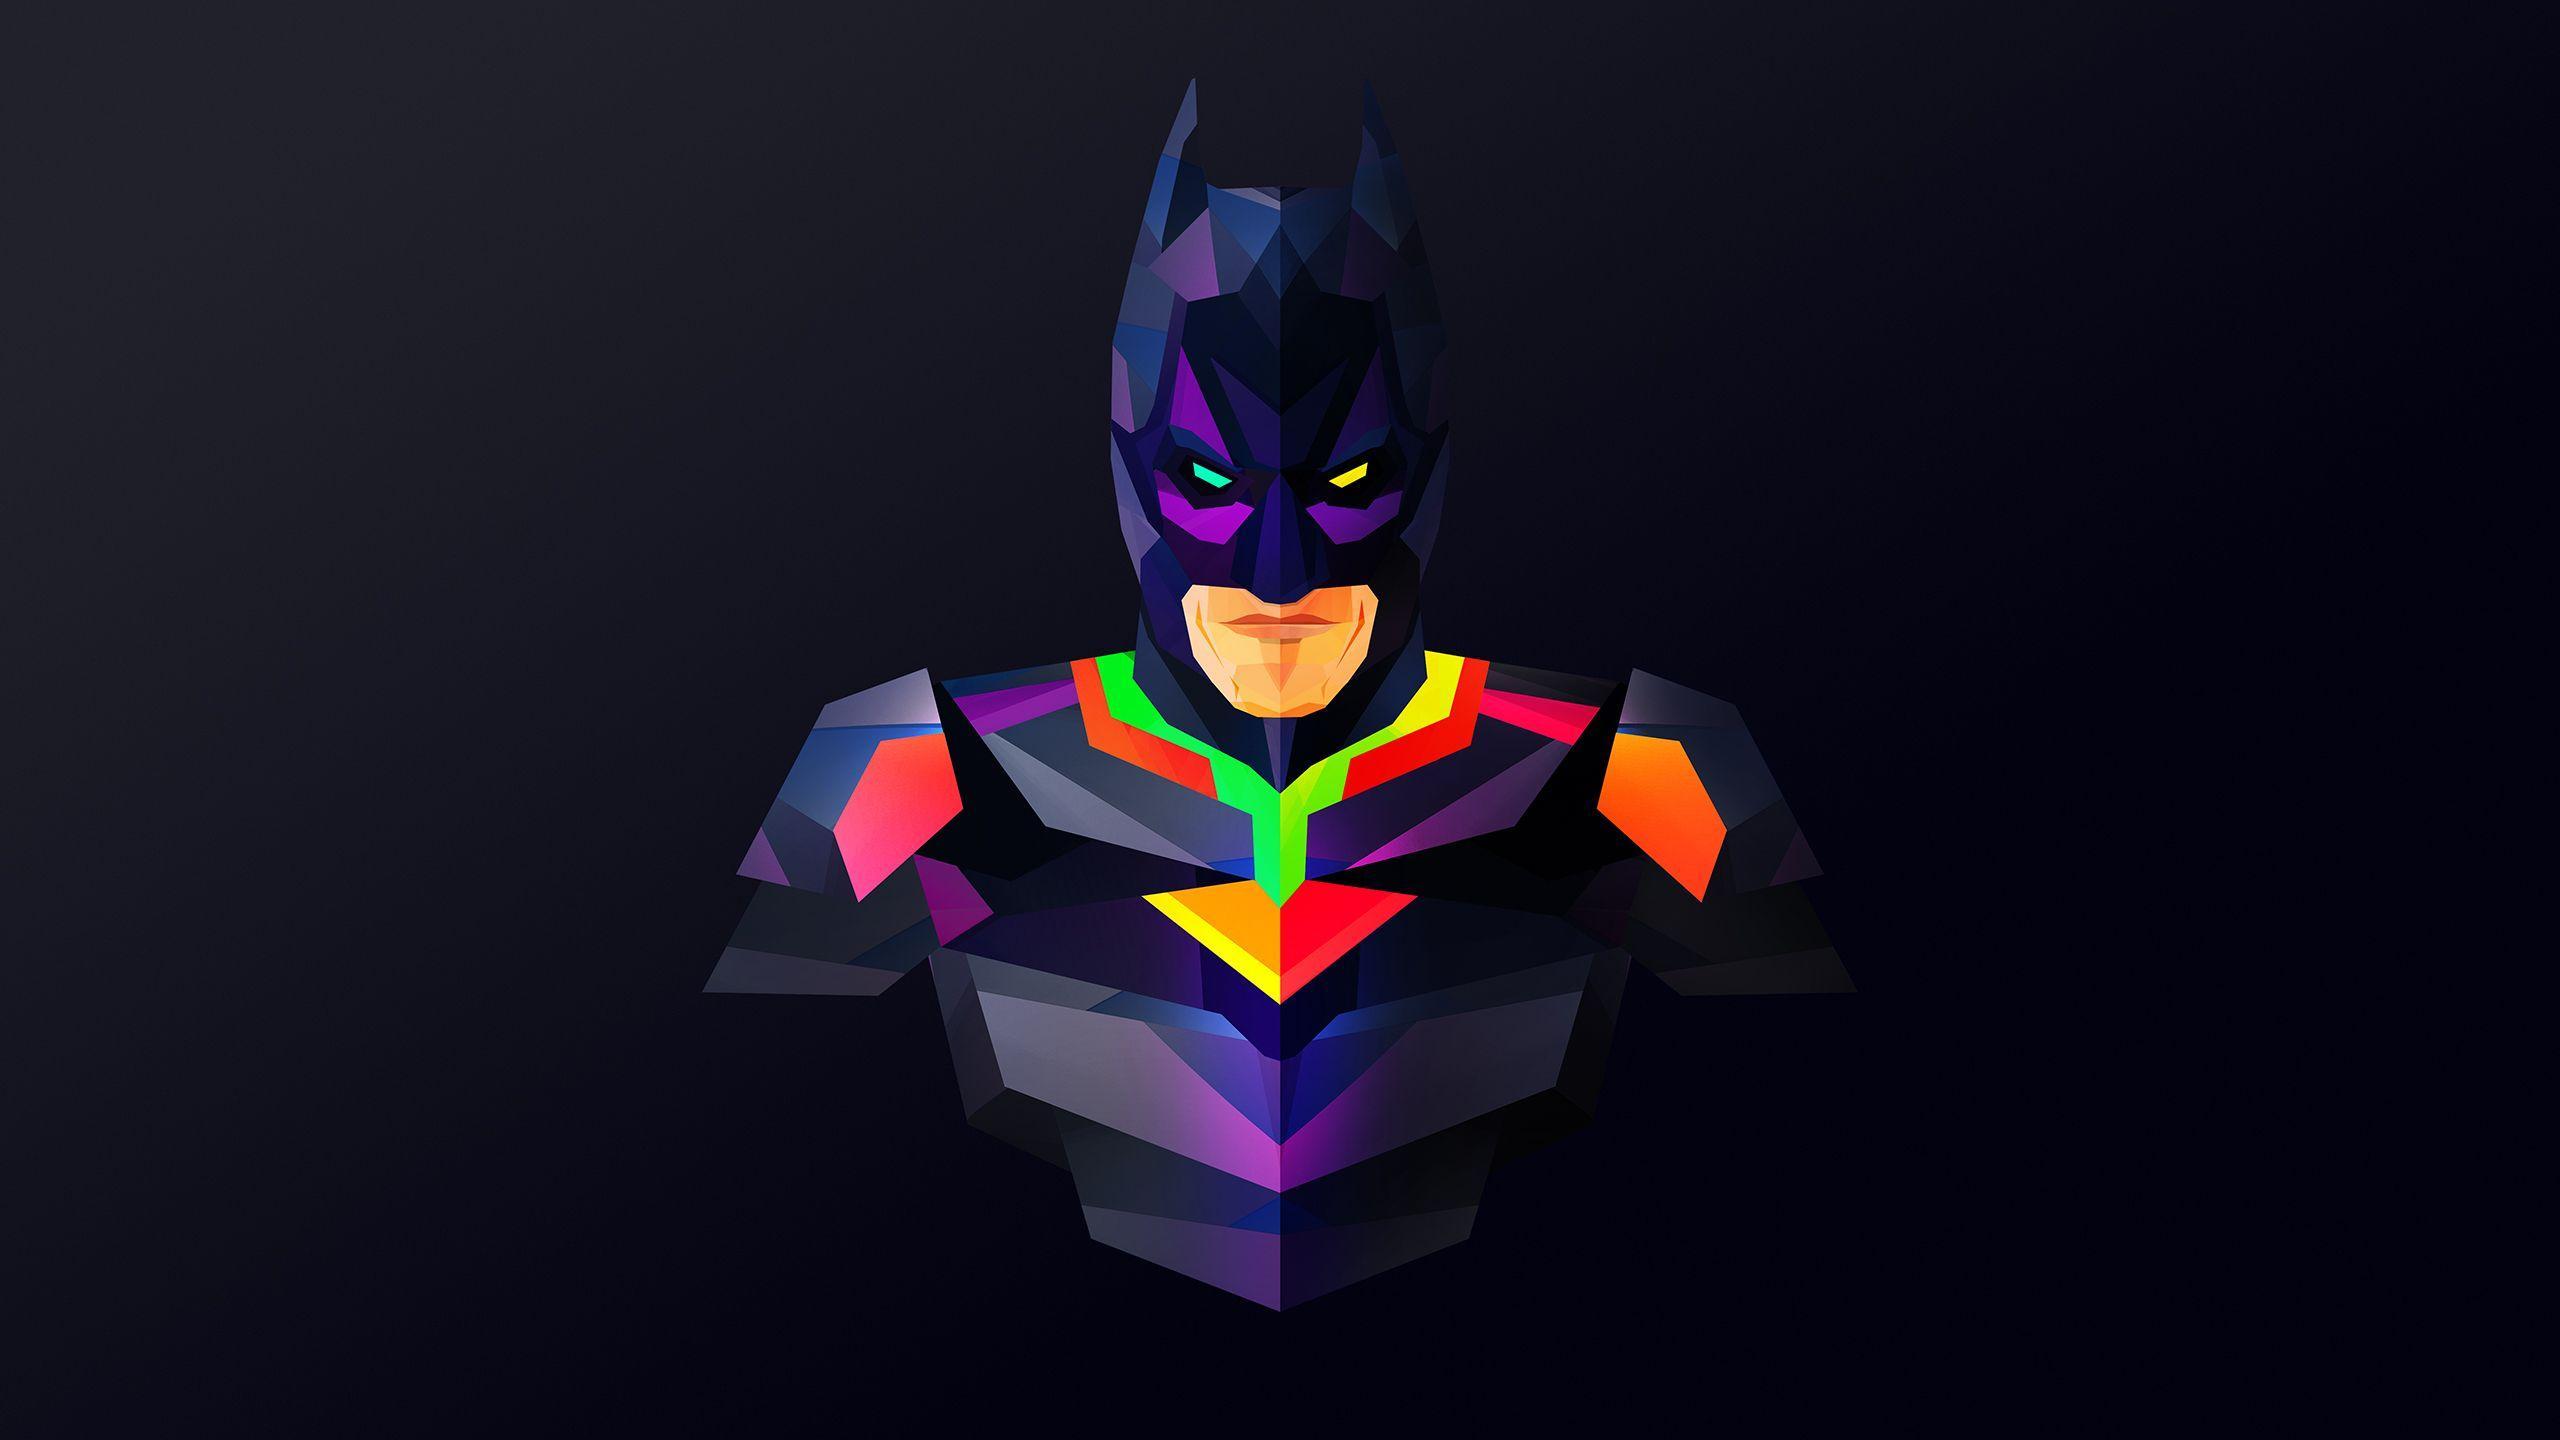 batman abstract wallpapers top